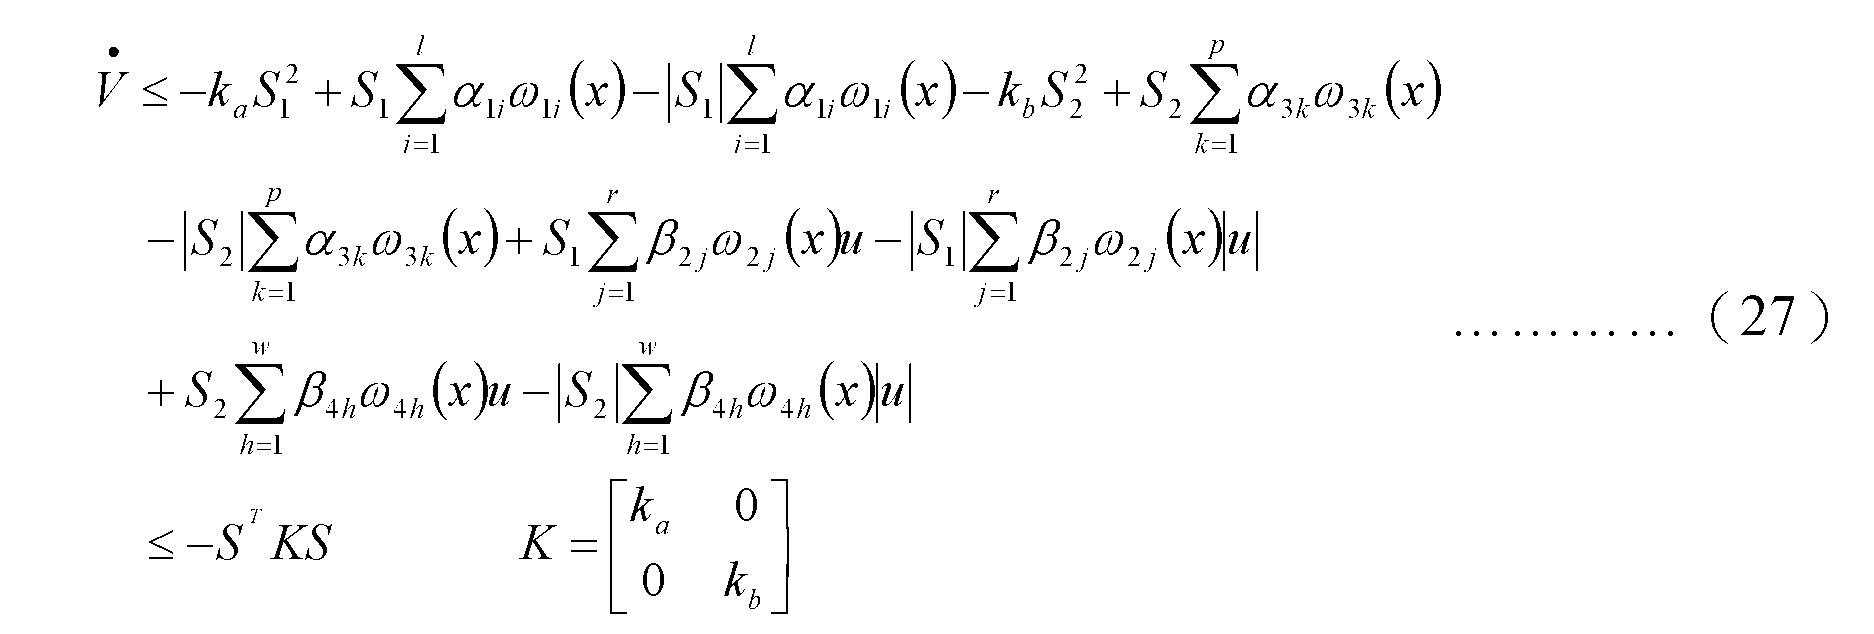 Figure 107143115-A0305-02-0012-76